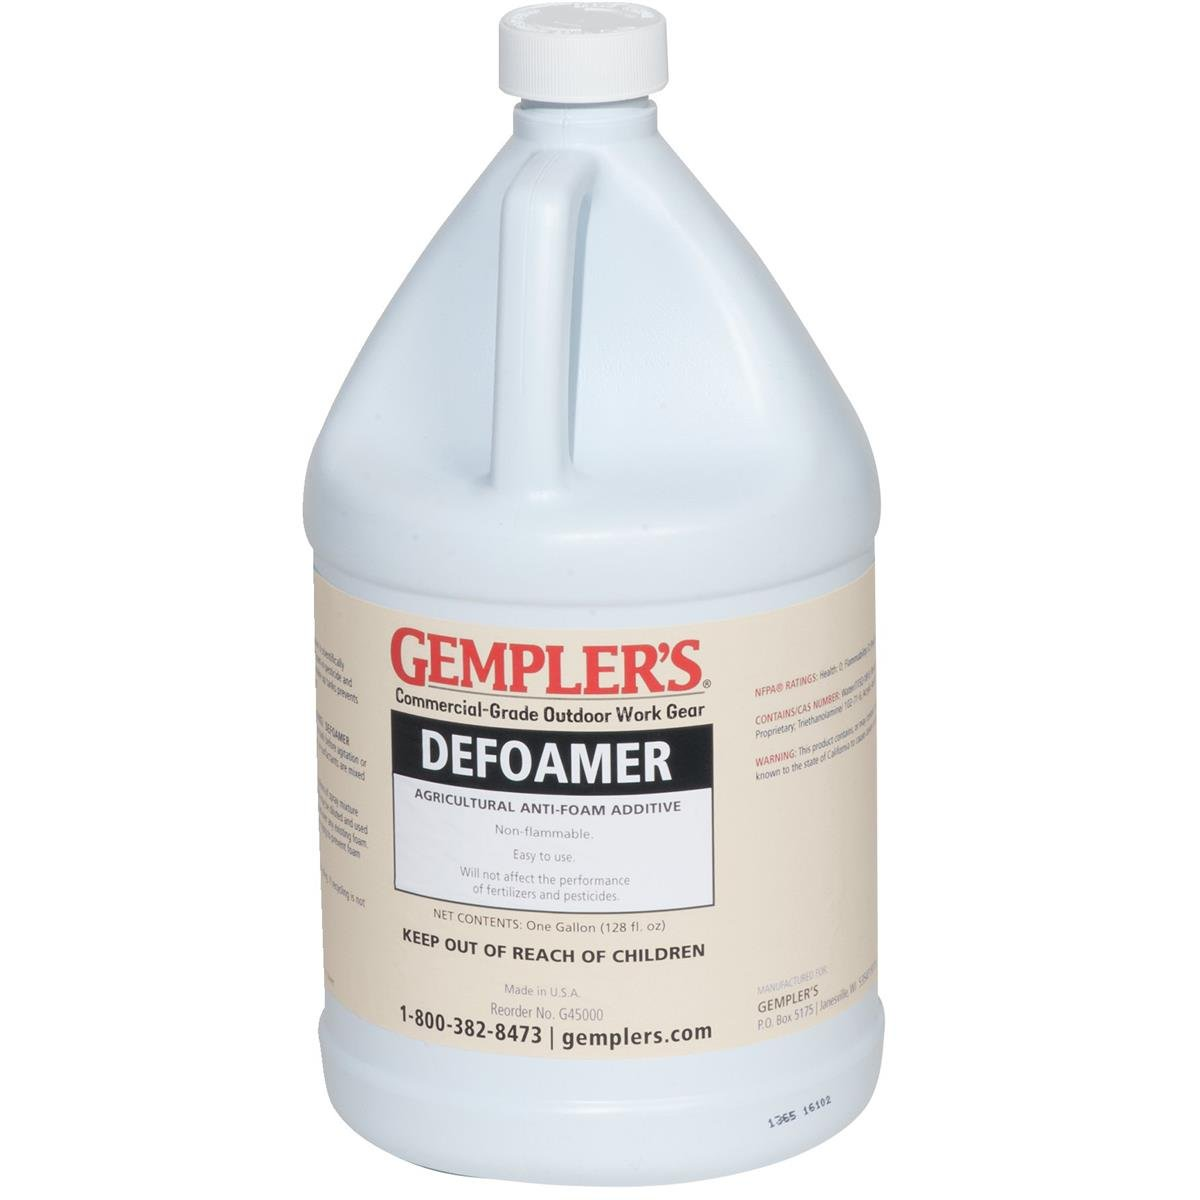 GEMPLER'S G45000 Pesticide and Fertilizer Defoamer Solution for Defoaming & Preventing Foam Build-up in Spray Tanks, 1 Gallon